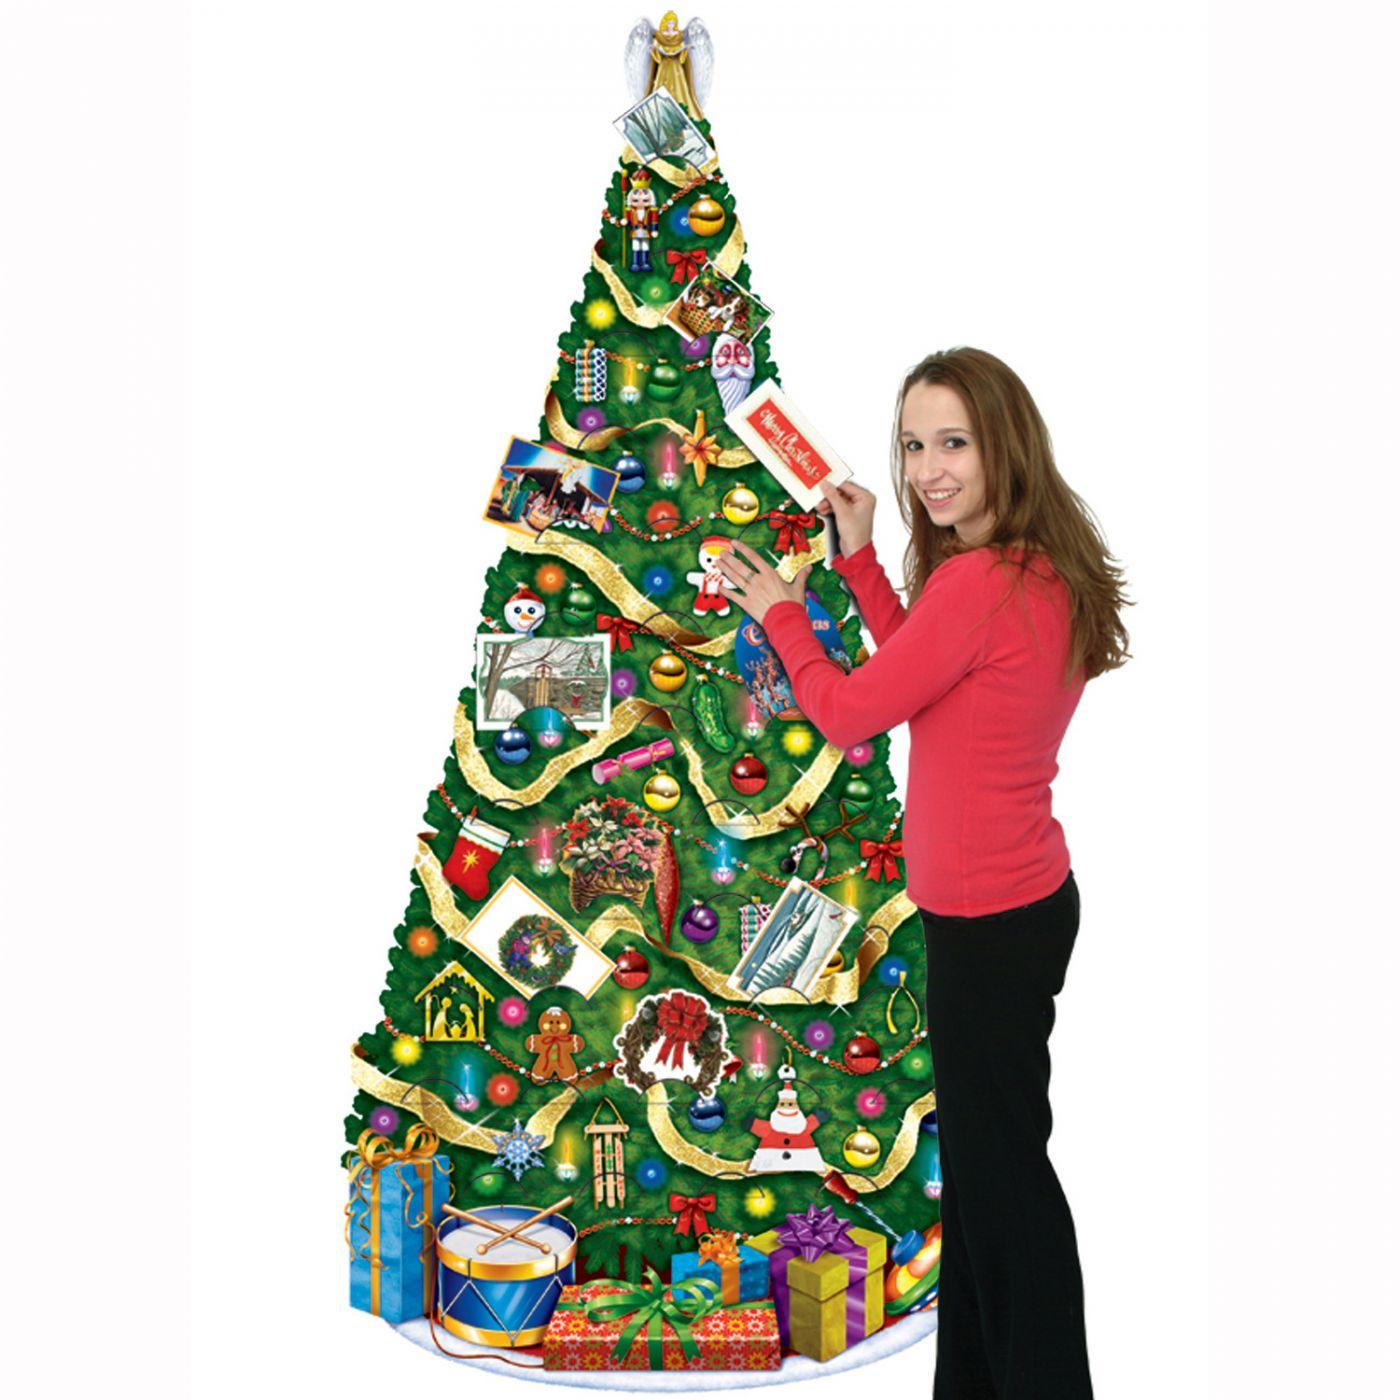 Jointed Christmas Tree image